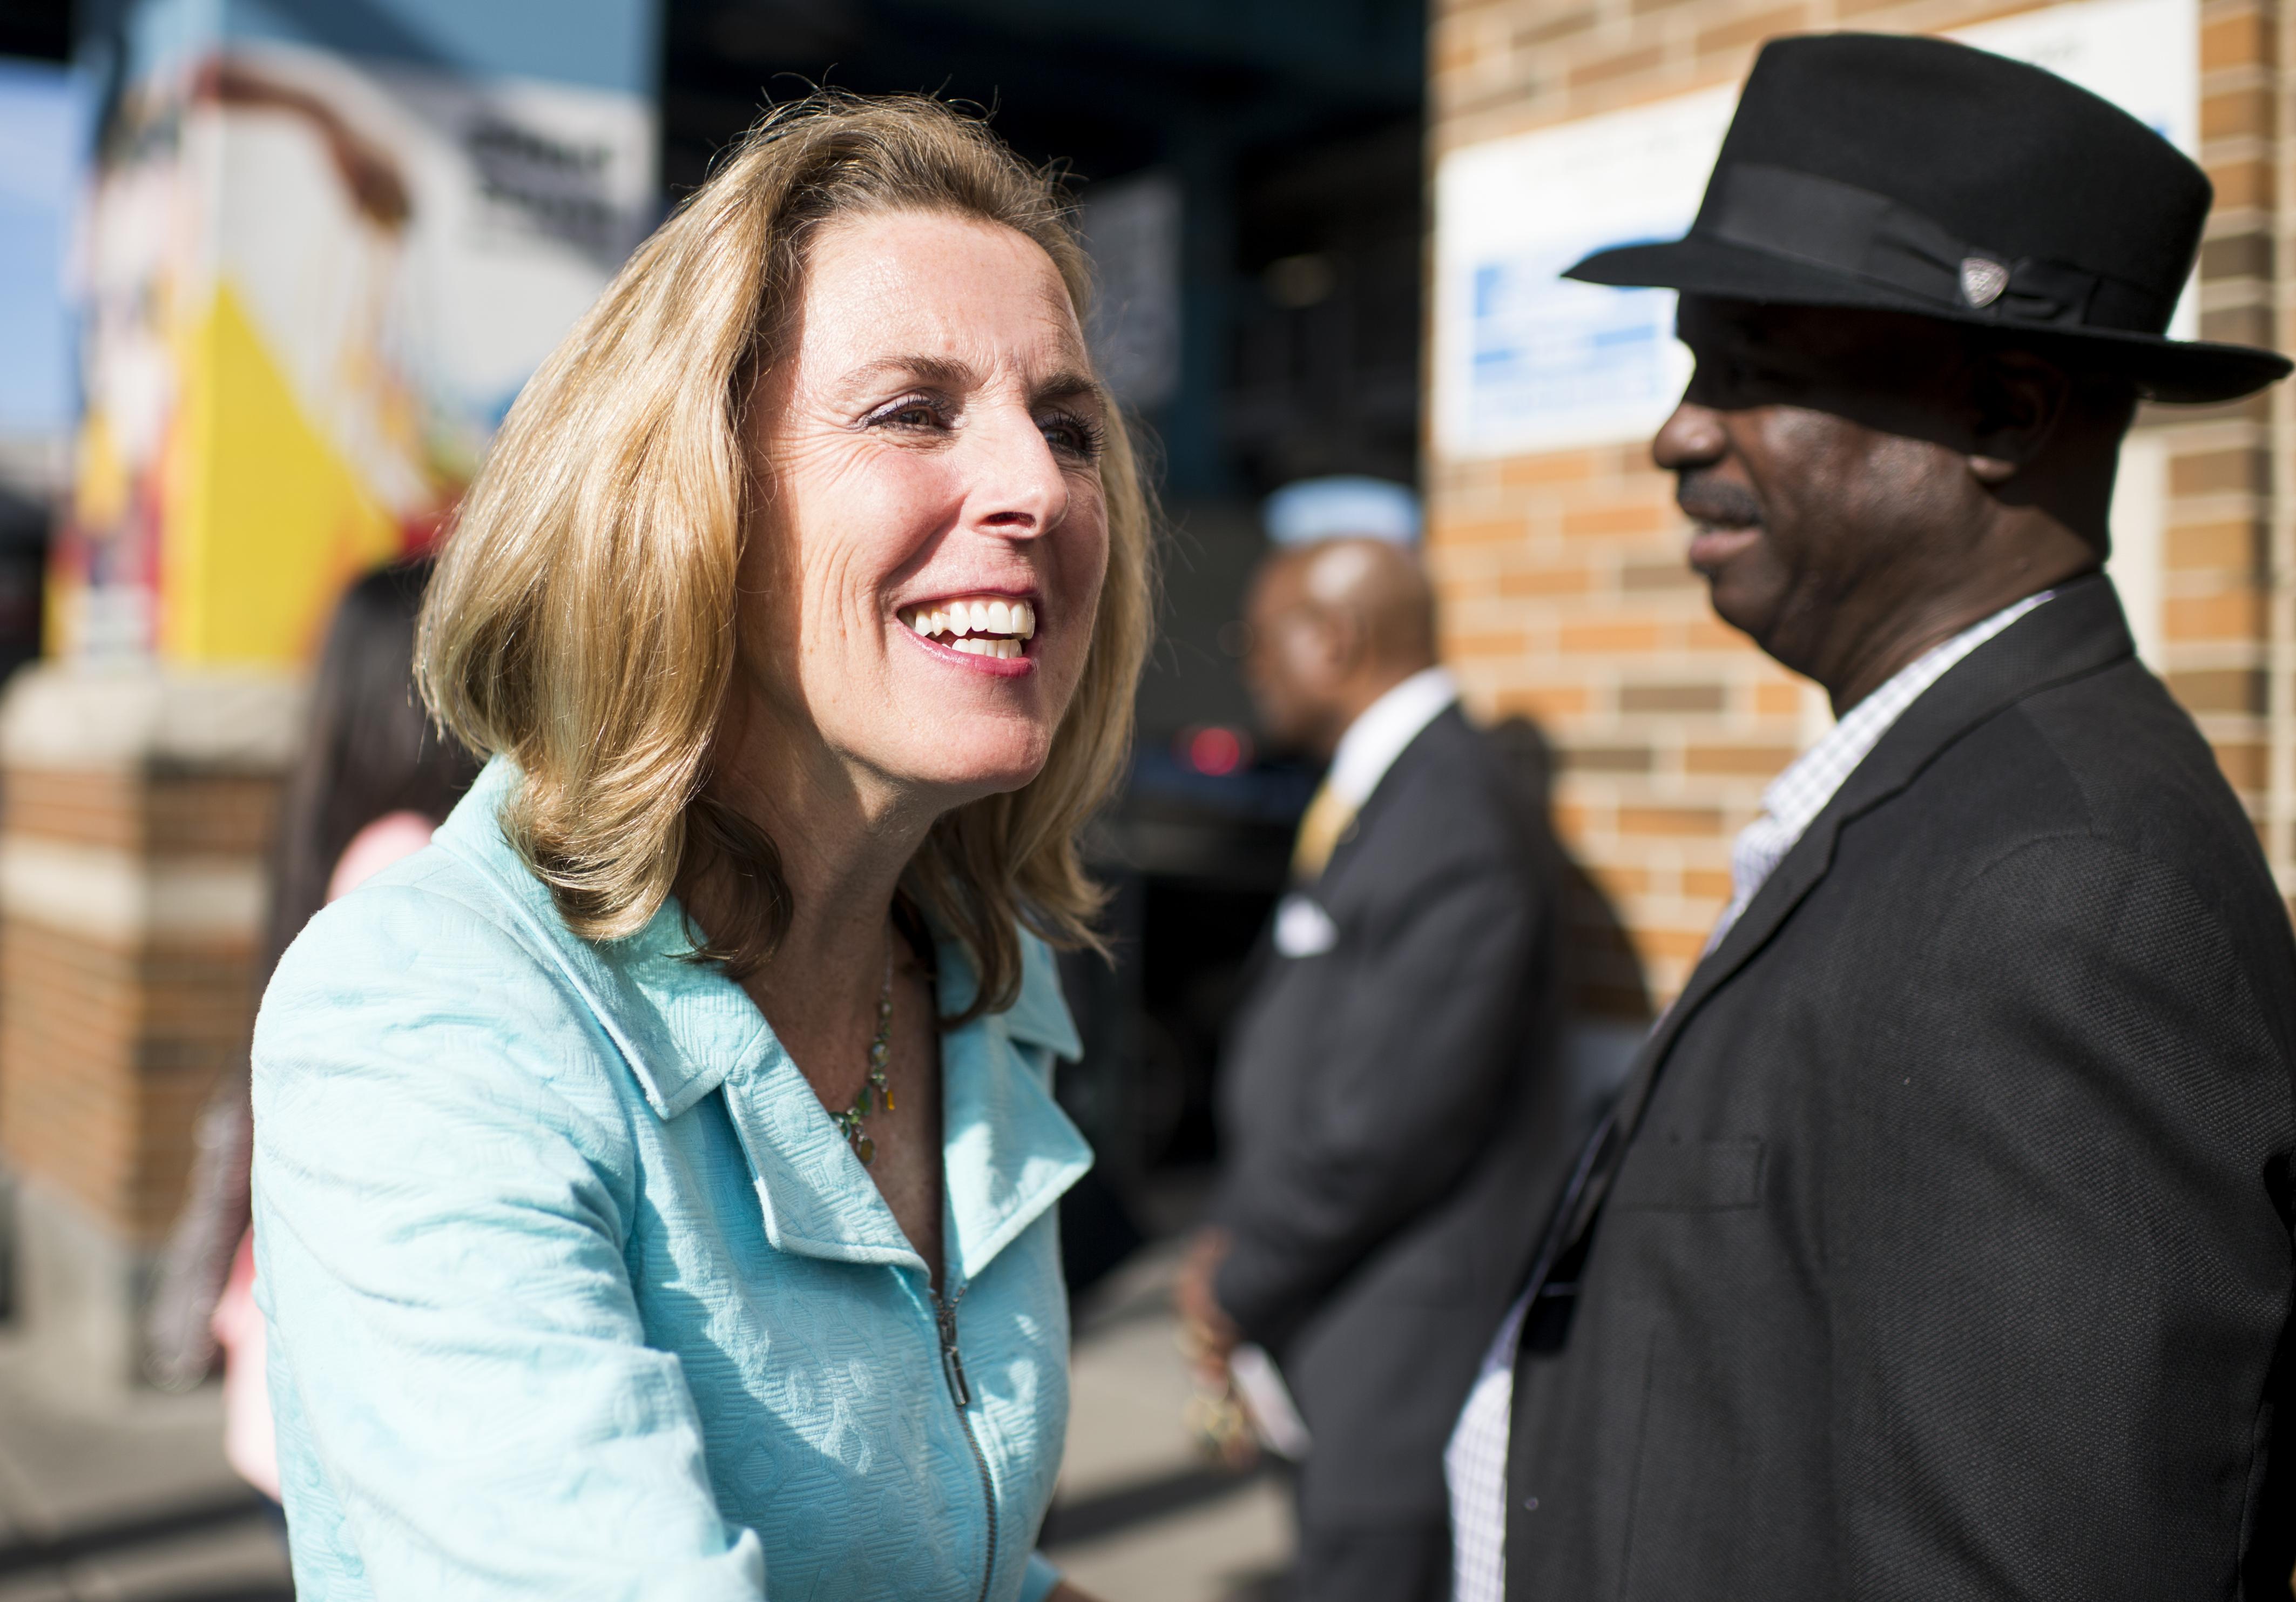 Pennsylvania U.S. Senate candidate Katie McGinty